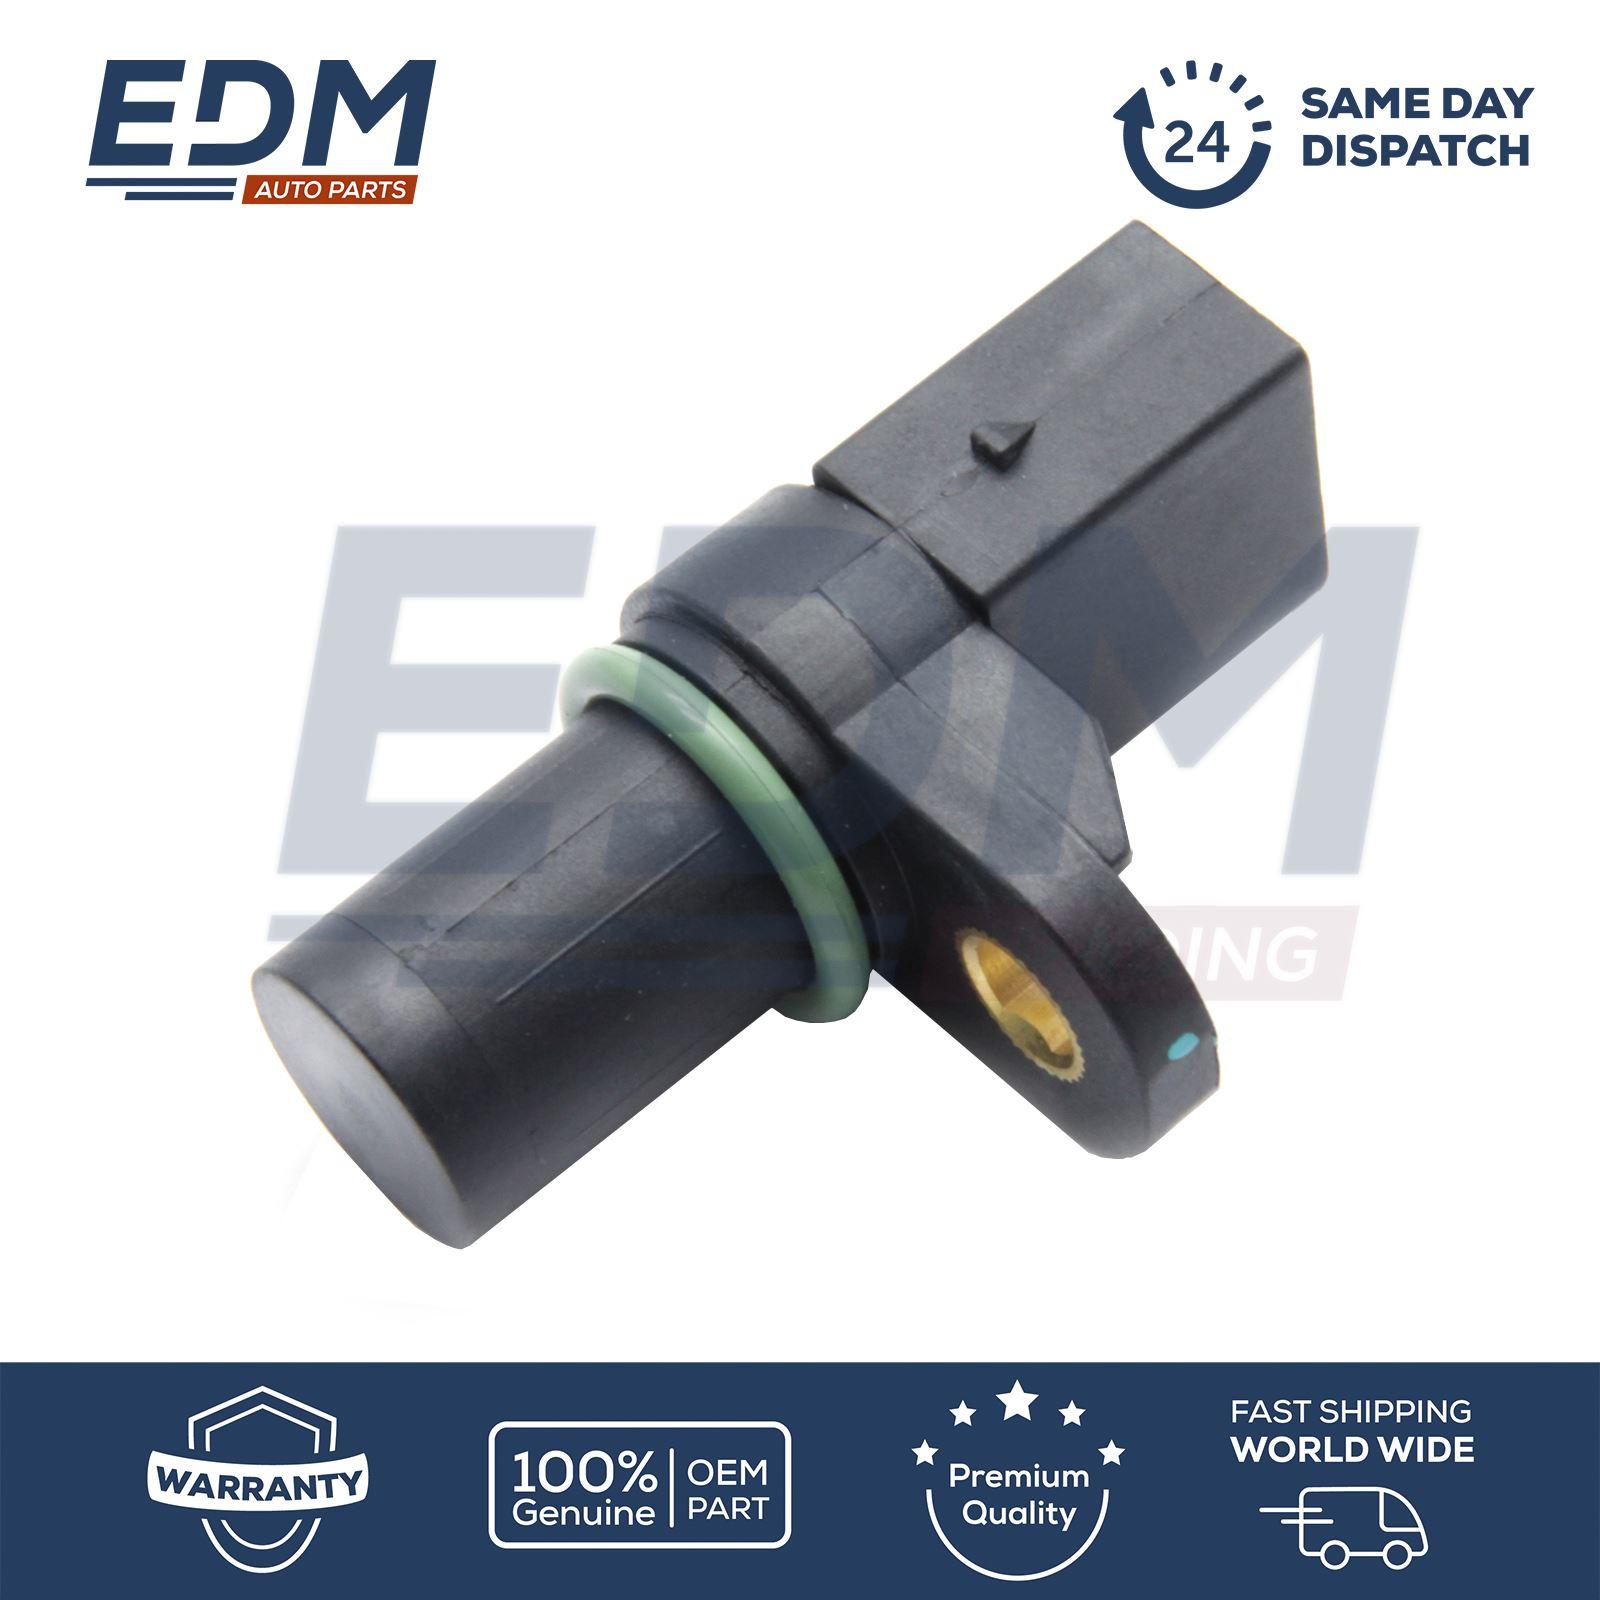 NEW TOPRAN Camshaft Sensor BMW E81 E87 E36 E46 E90 E91 E39